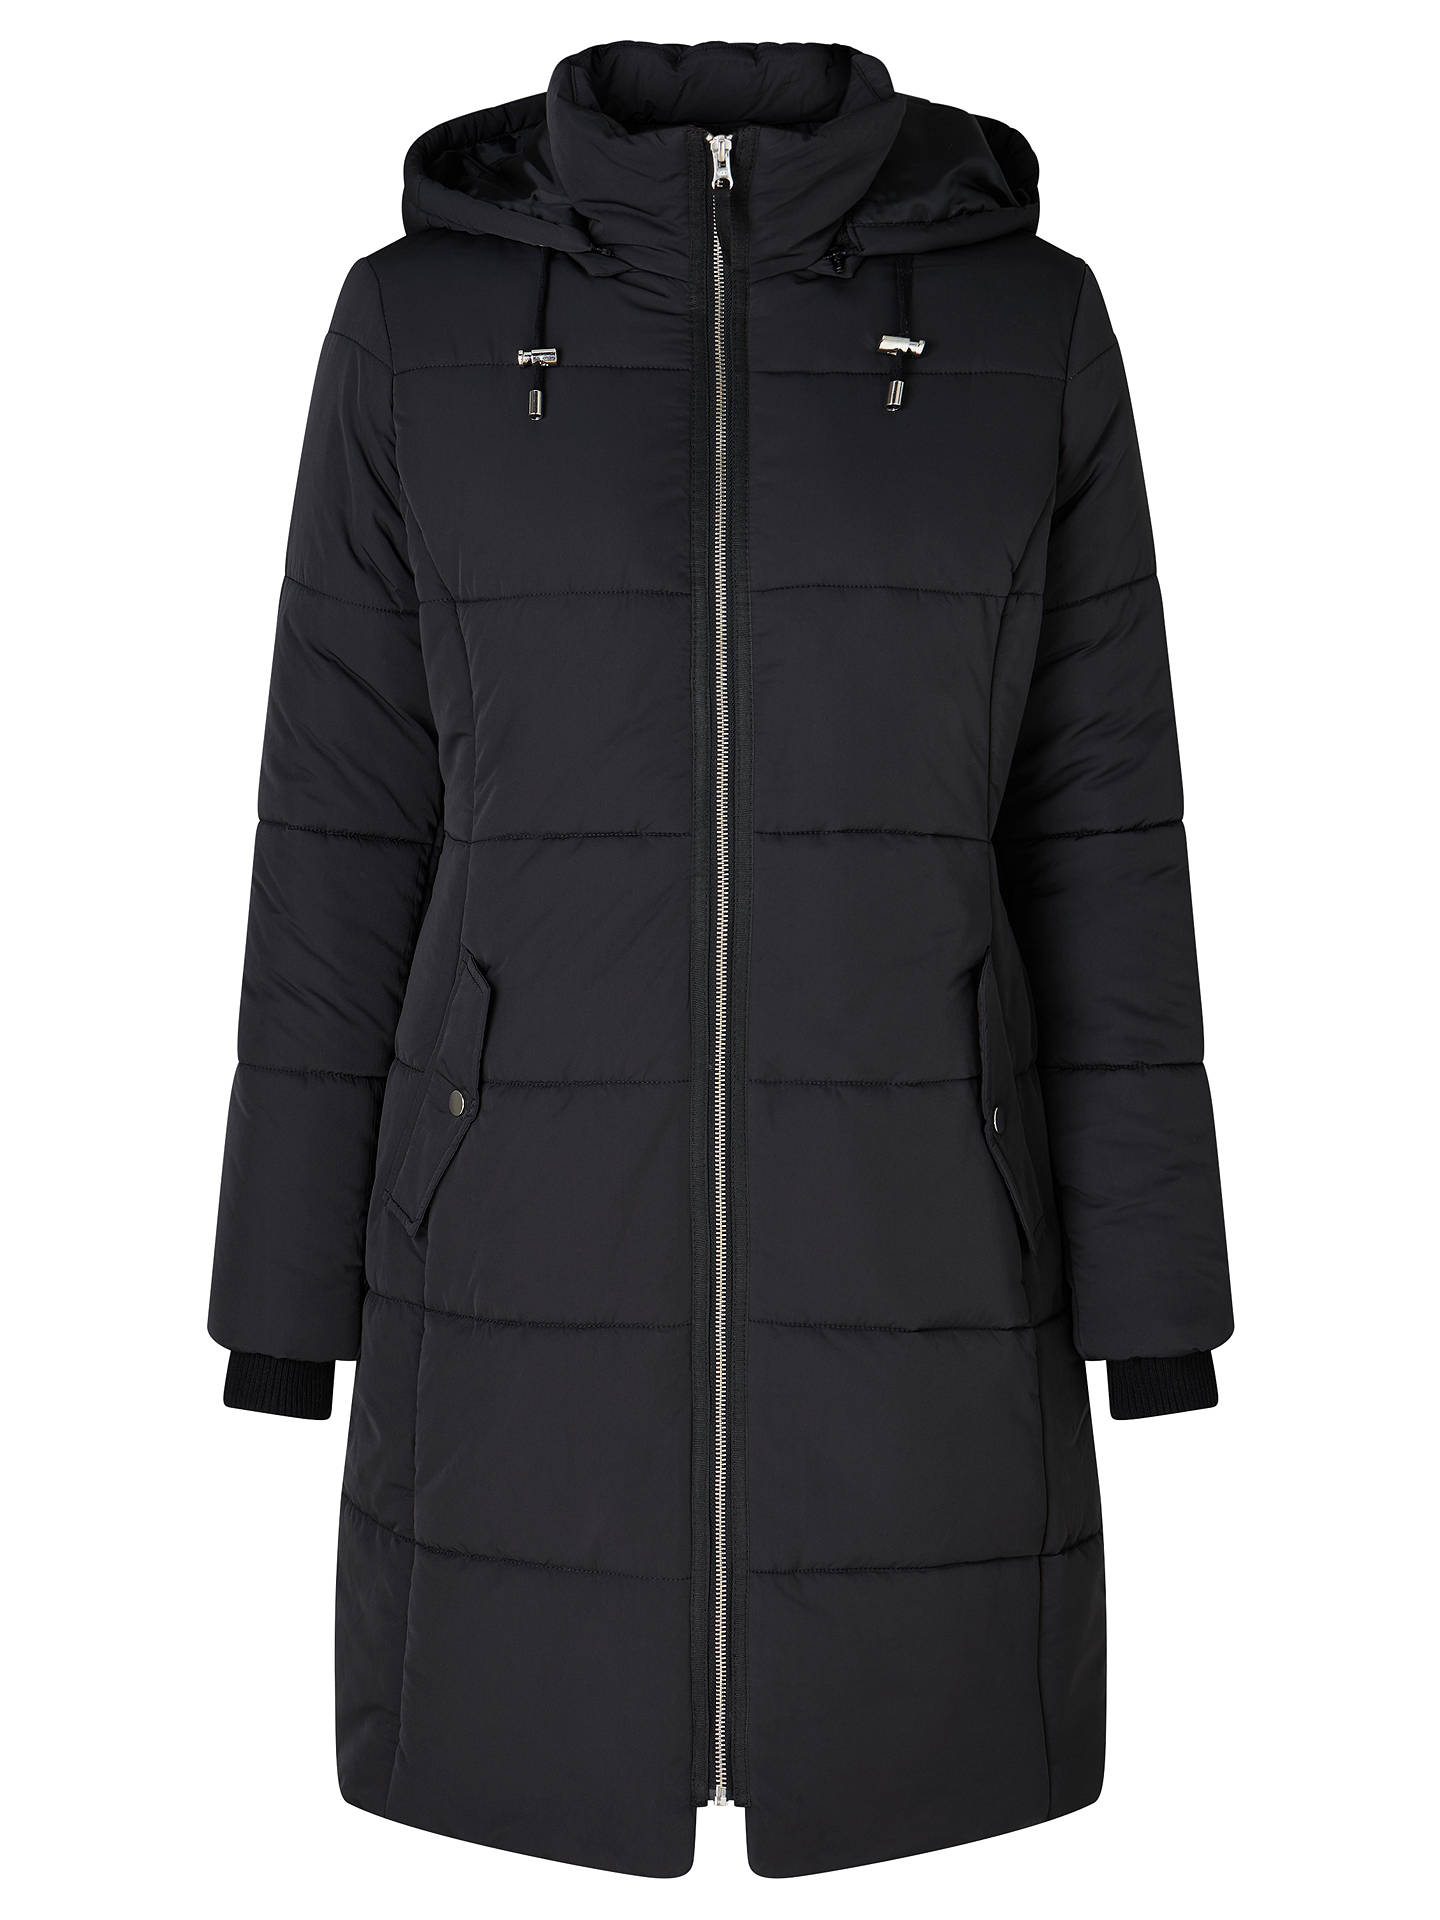 2997e207f John Lewis Long Padded Puffer Jacket, Black at John Lewis & Partners